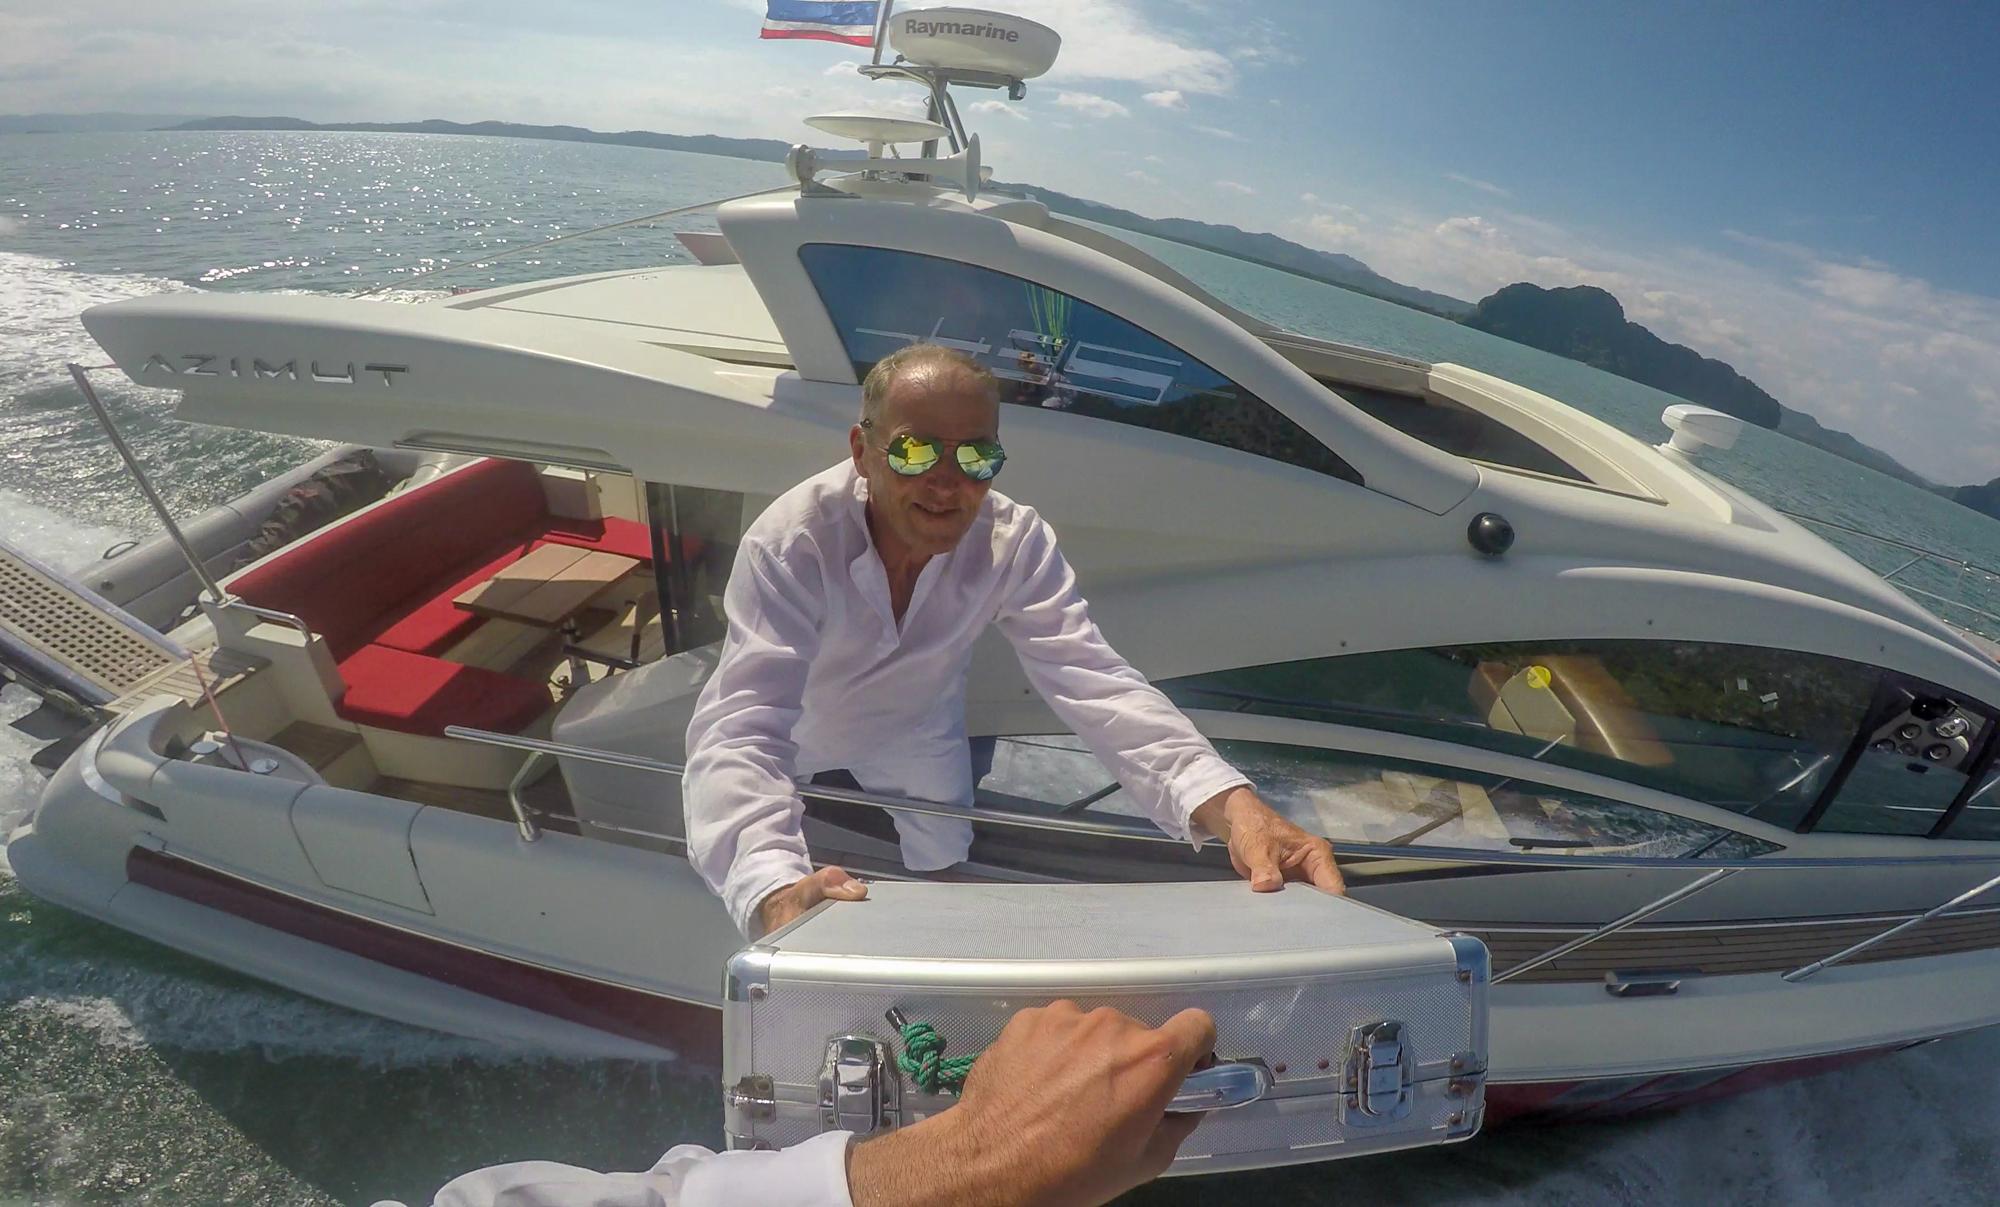 Don't Try This at Home James Bond Martin Schricke Francois Ragolski Jetski paragliding yacht Jean Yv